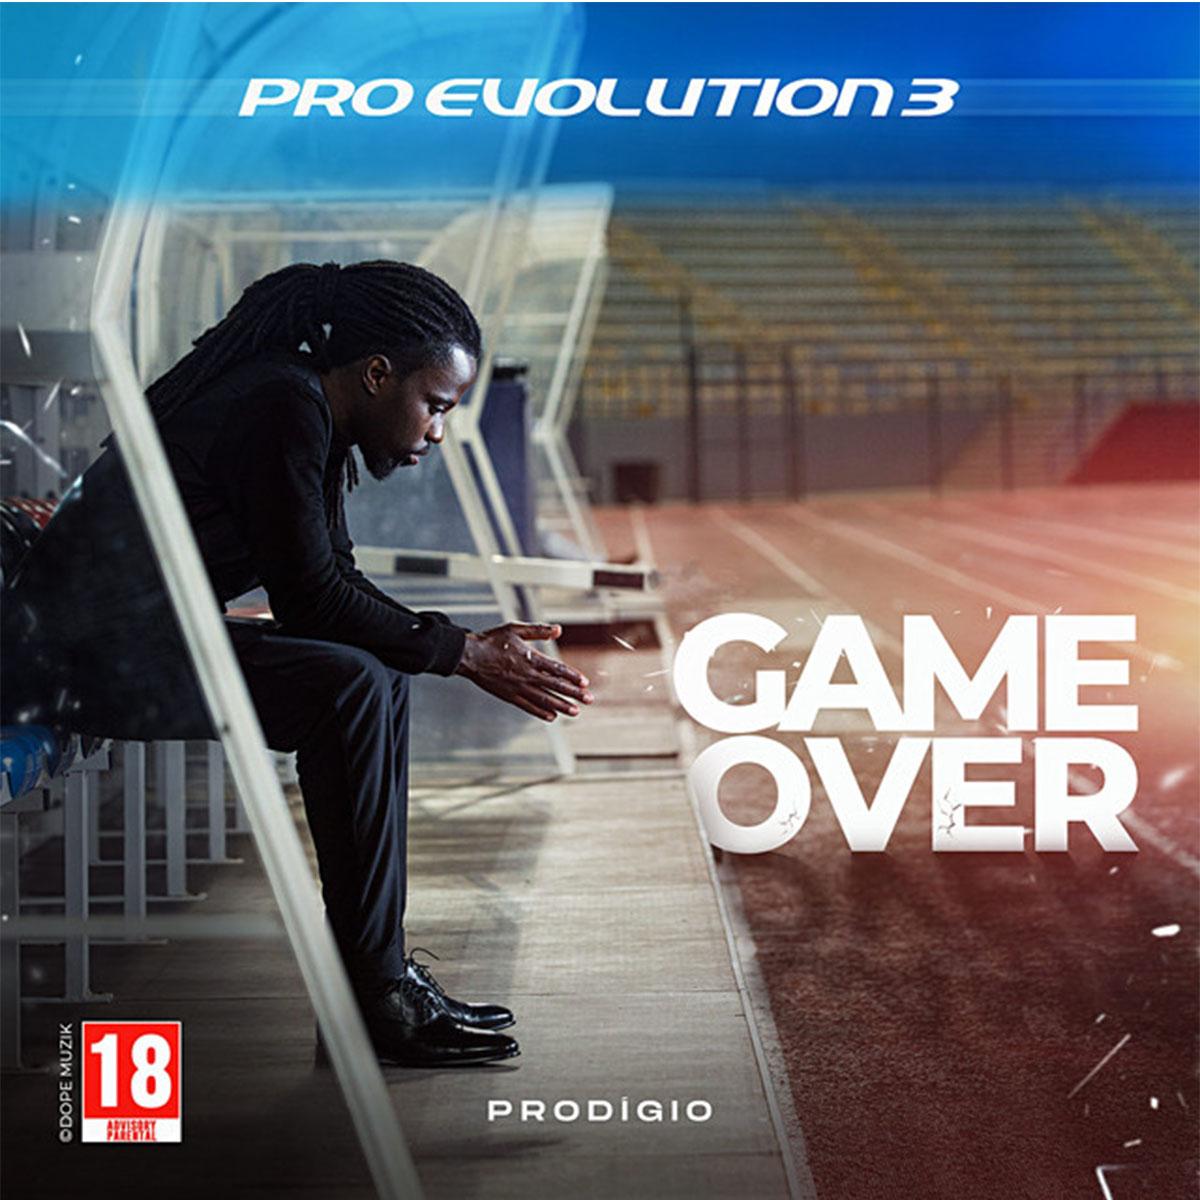 Prodígio – Pro Evolution 3 (Game Over) [Mixtape]